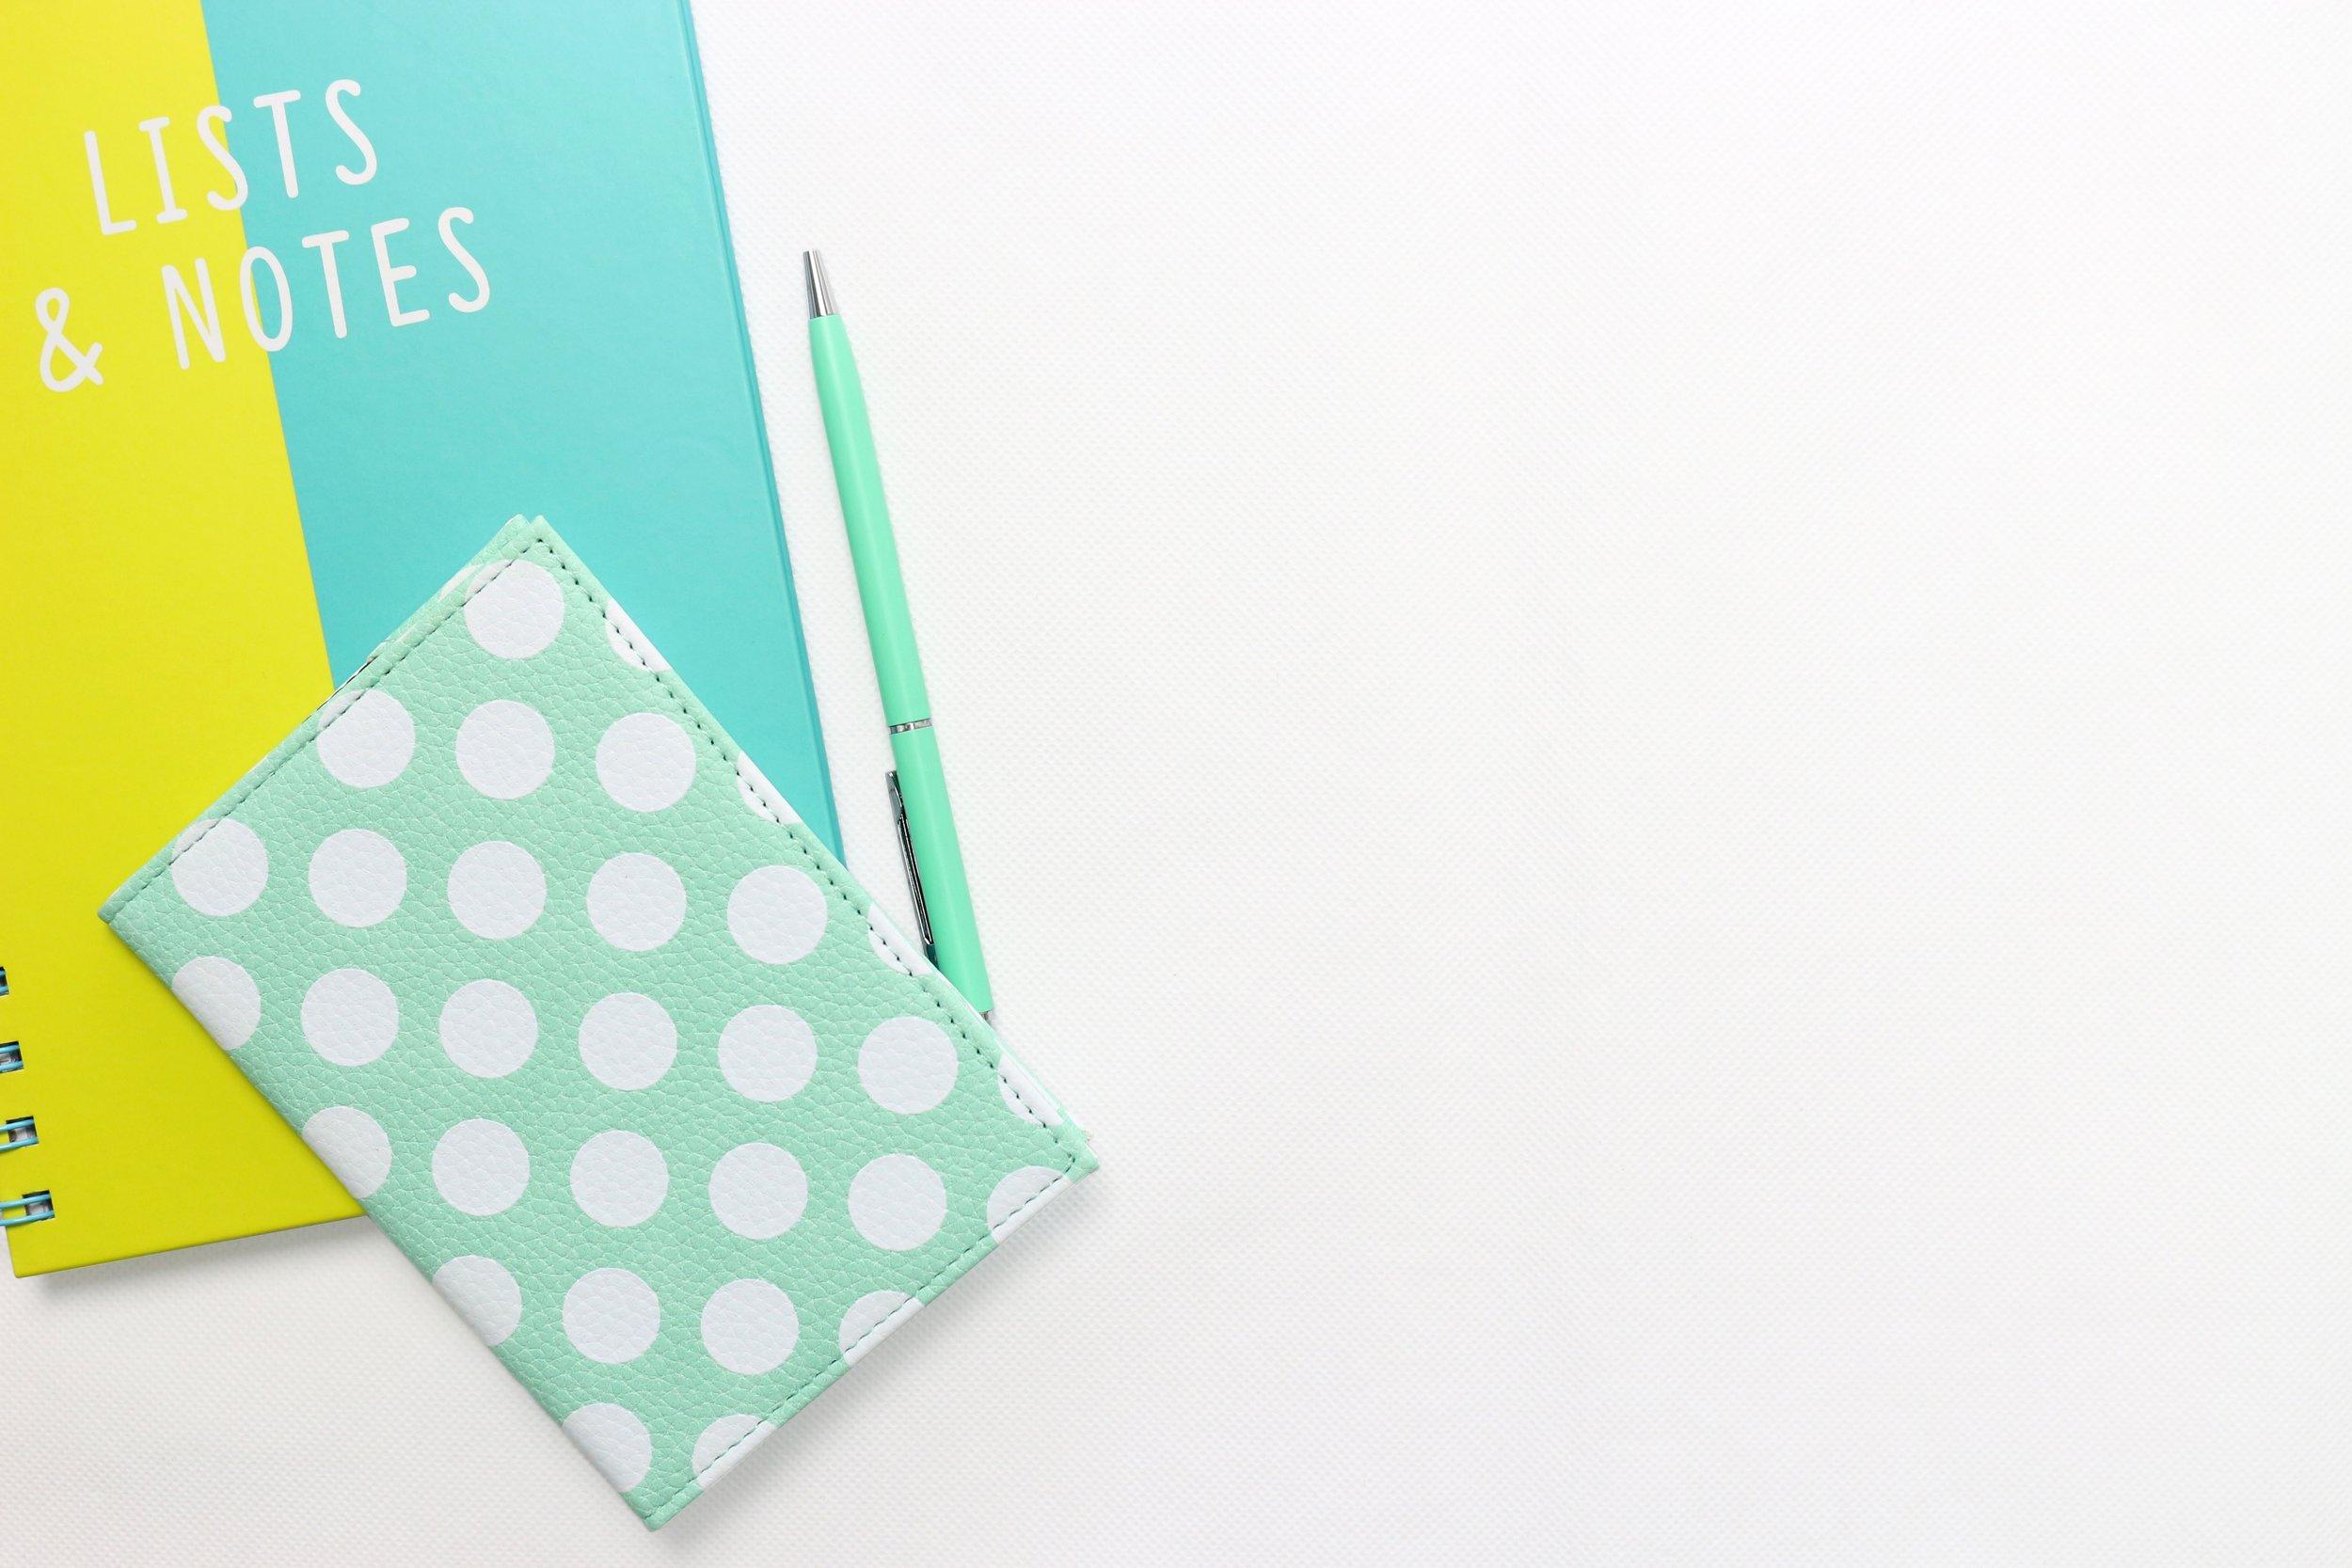 notebook photo.jpg